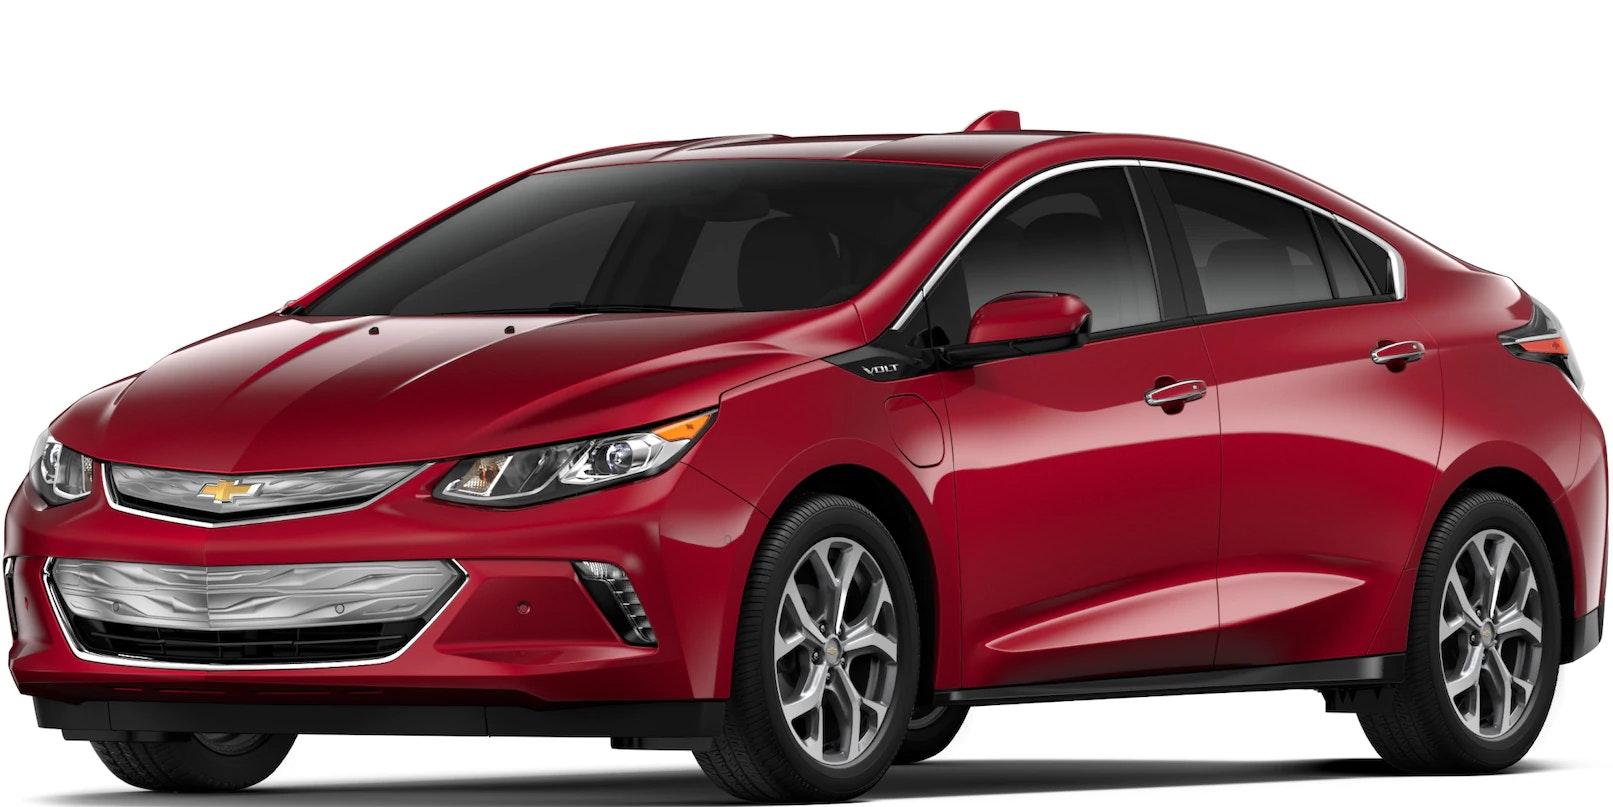 2017 Volt: Hybrid Electric Cars | Chevrolet